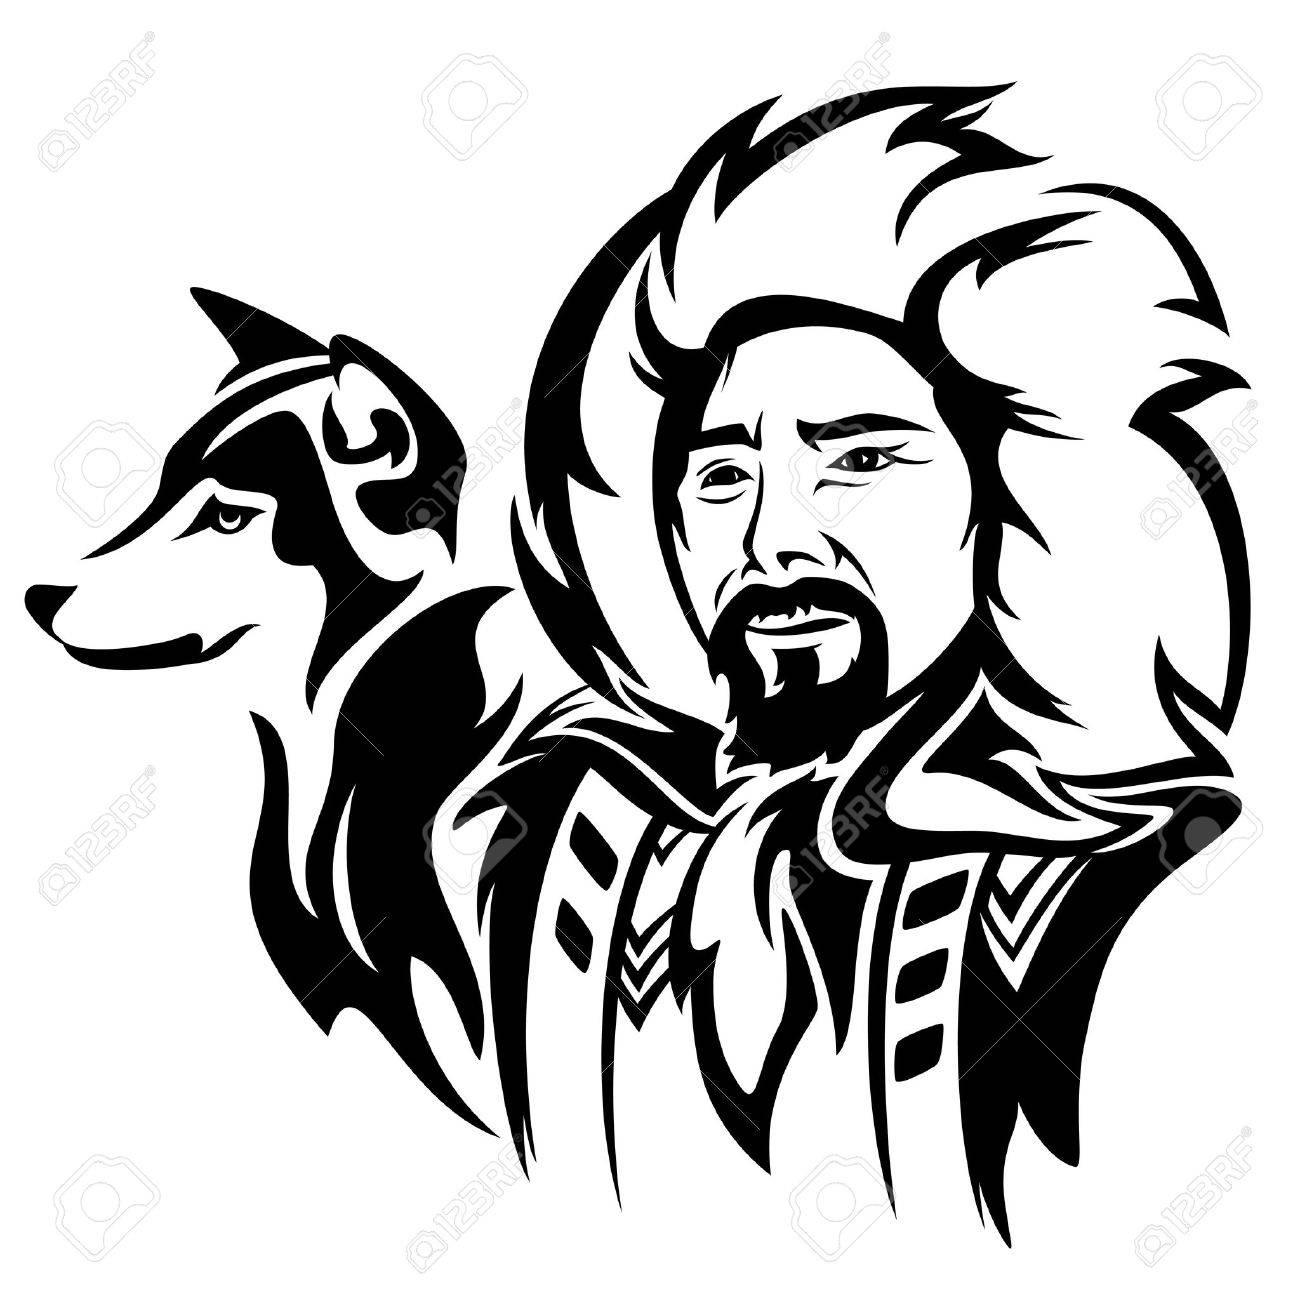 eskimo man with husky dog - black and white vector portrait - 30221150